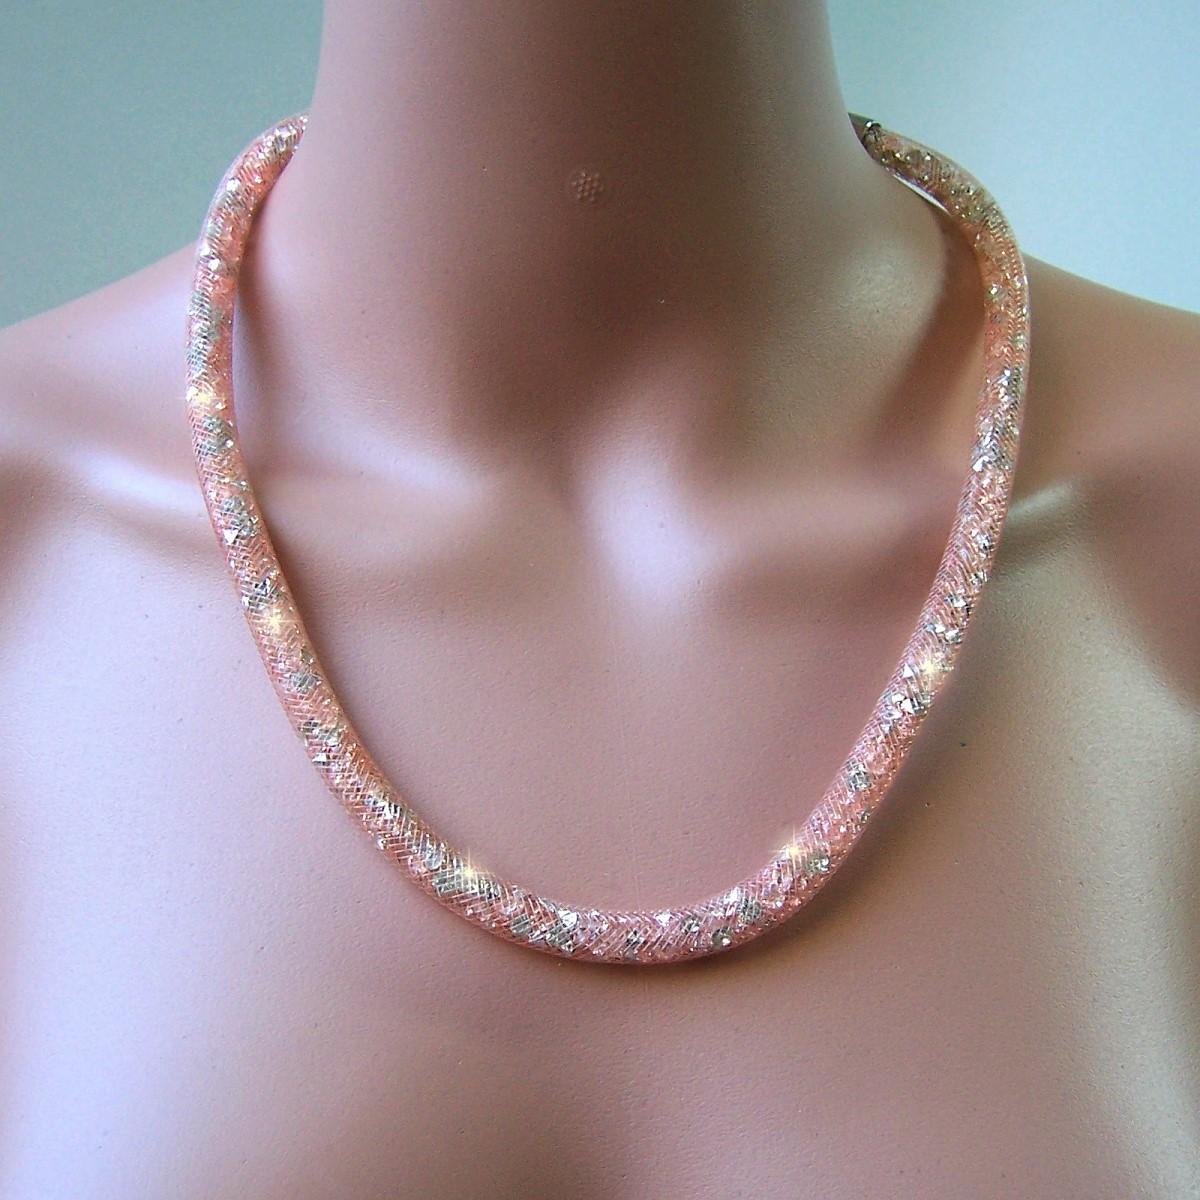 K2336# Collier 58cm lang Strasskristalle rosé in 3D-Netzschlauch